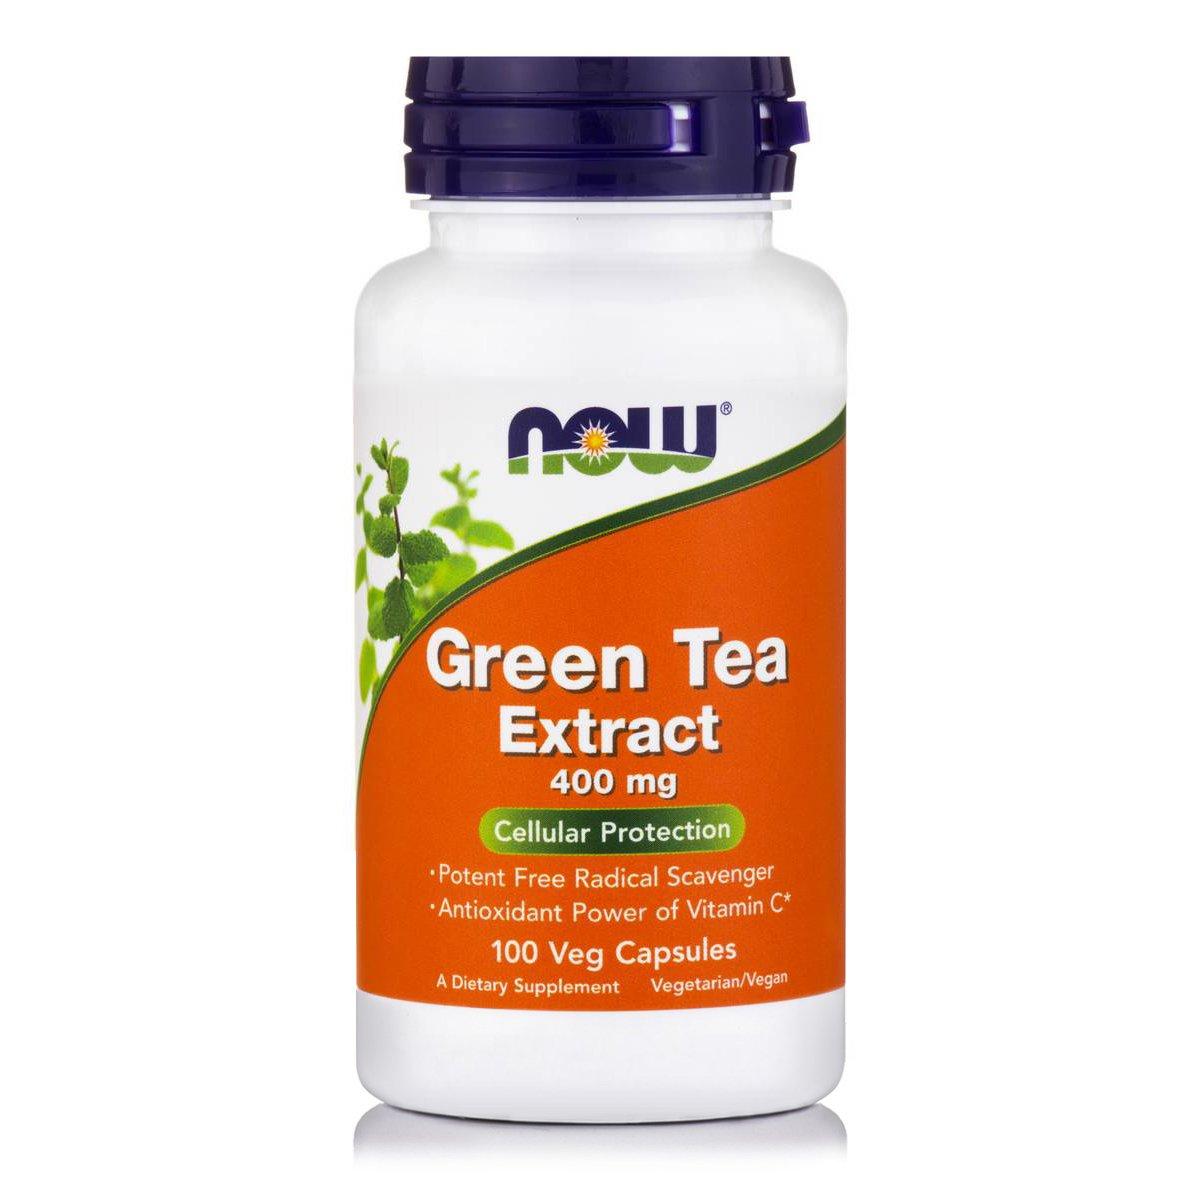 Superfoods Πράσινο Τσάι EUBIAS Super-Ευεργετική Δράση Για Μια Ζωή Γεμάτη Υγεία Για Μακροζωία 50caps